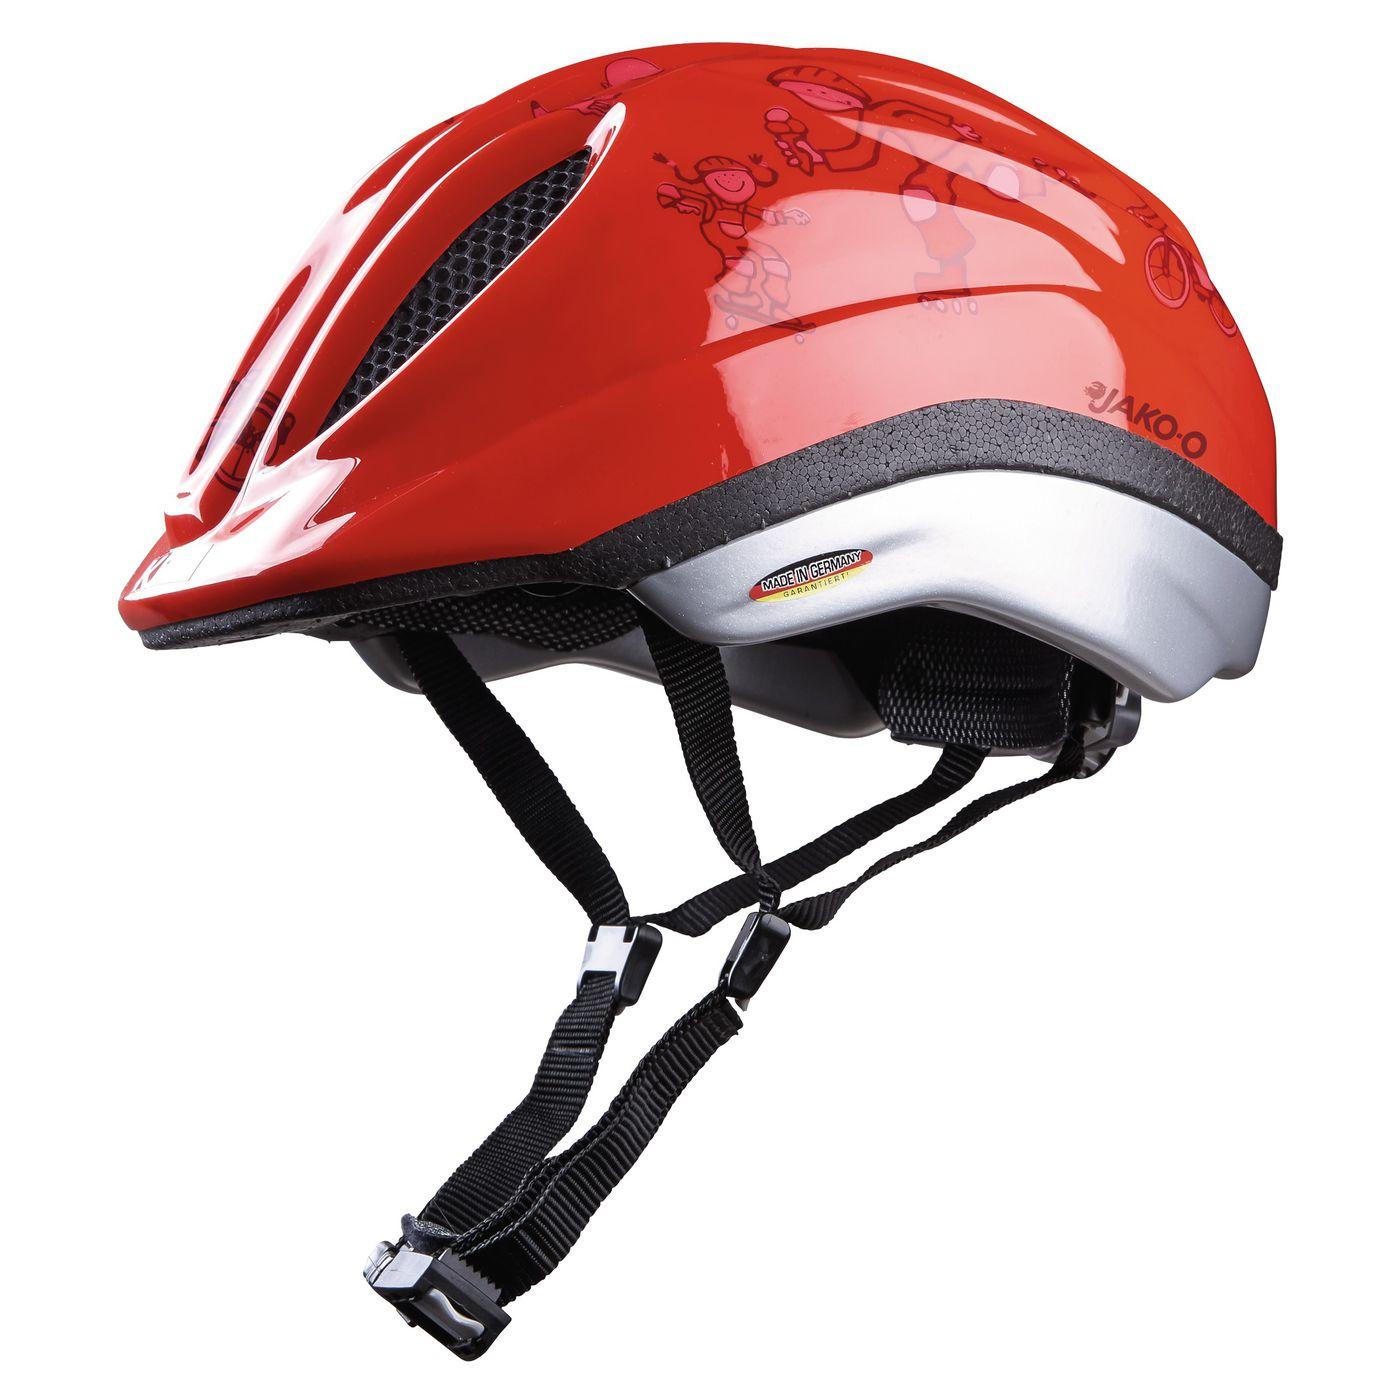 Детский велосипед шлем JAKO‑O